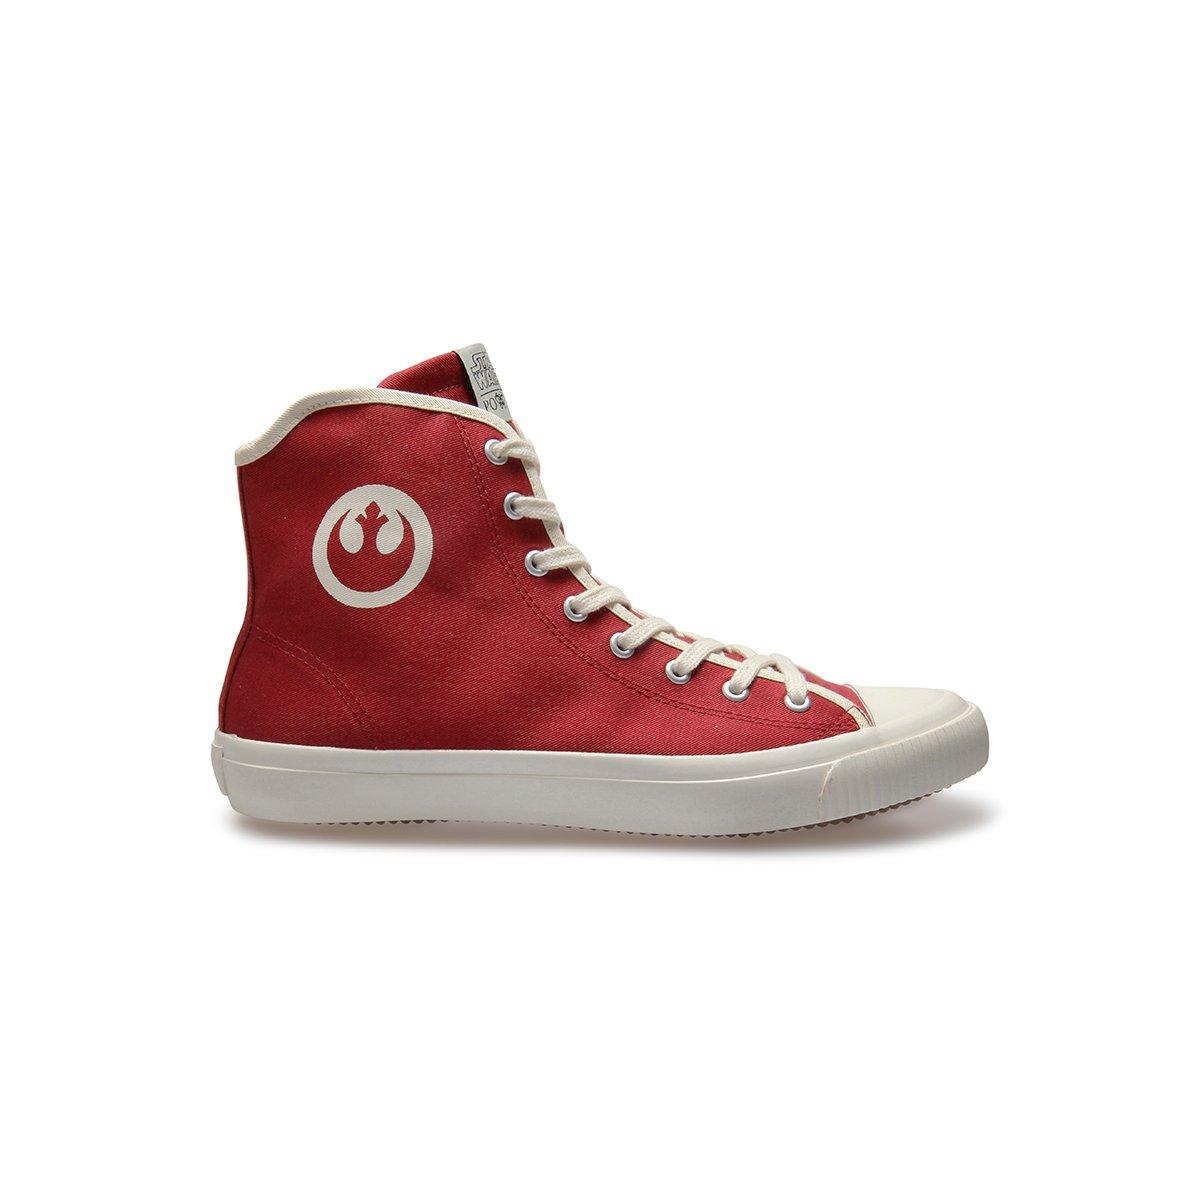 PO-ZU Rebel High-Top Sneakers